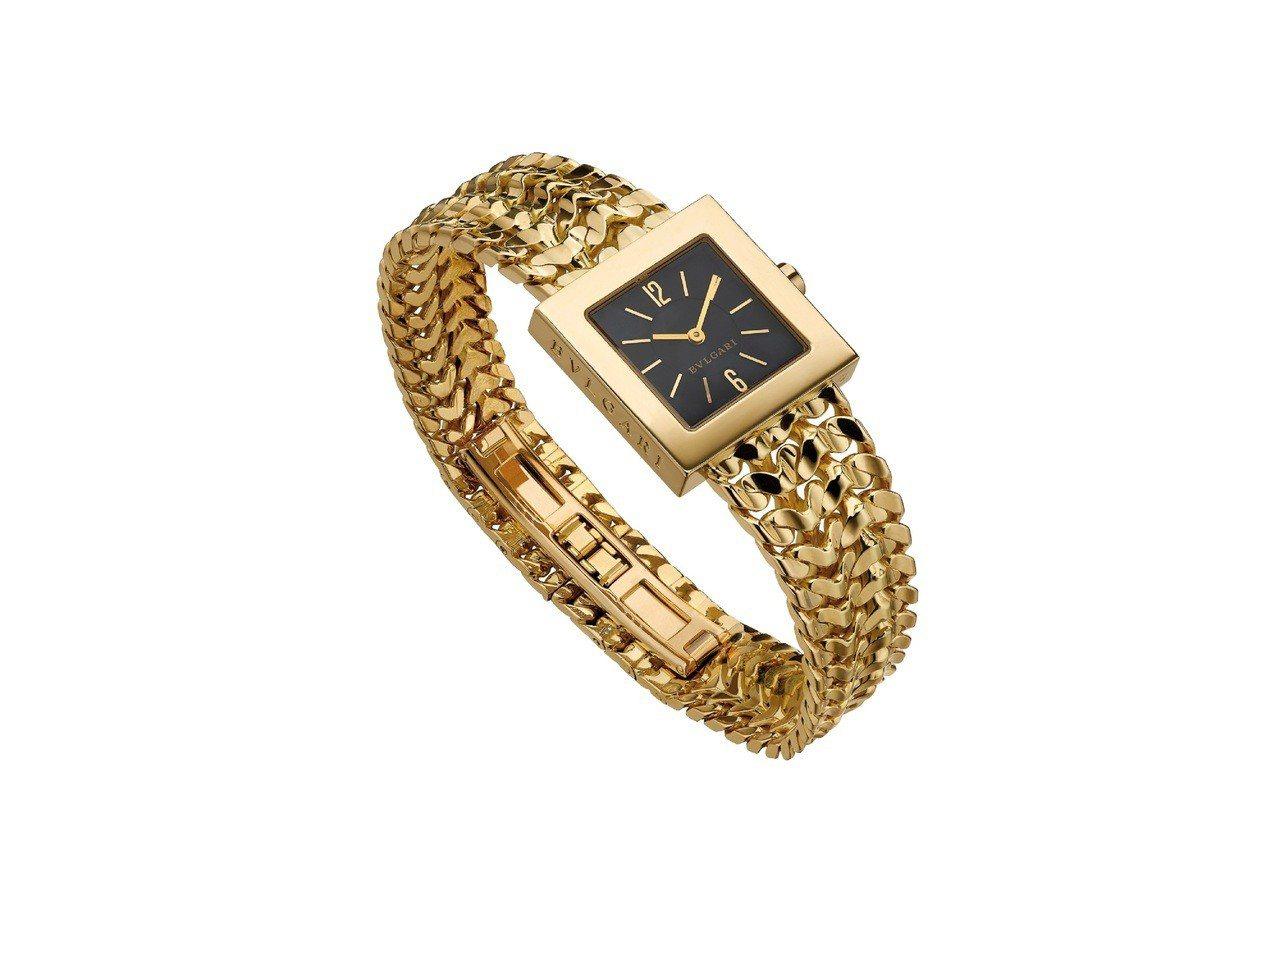 BVLGARI Hertaige典藏系列黃K金腕錶,於西元1990年創作(MUS...